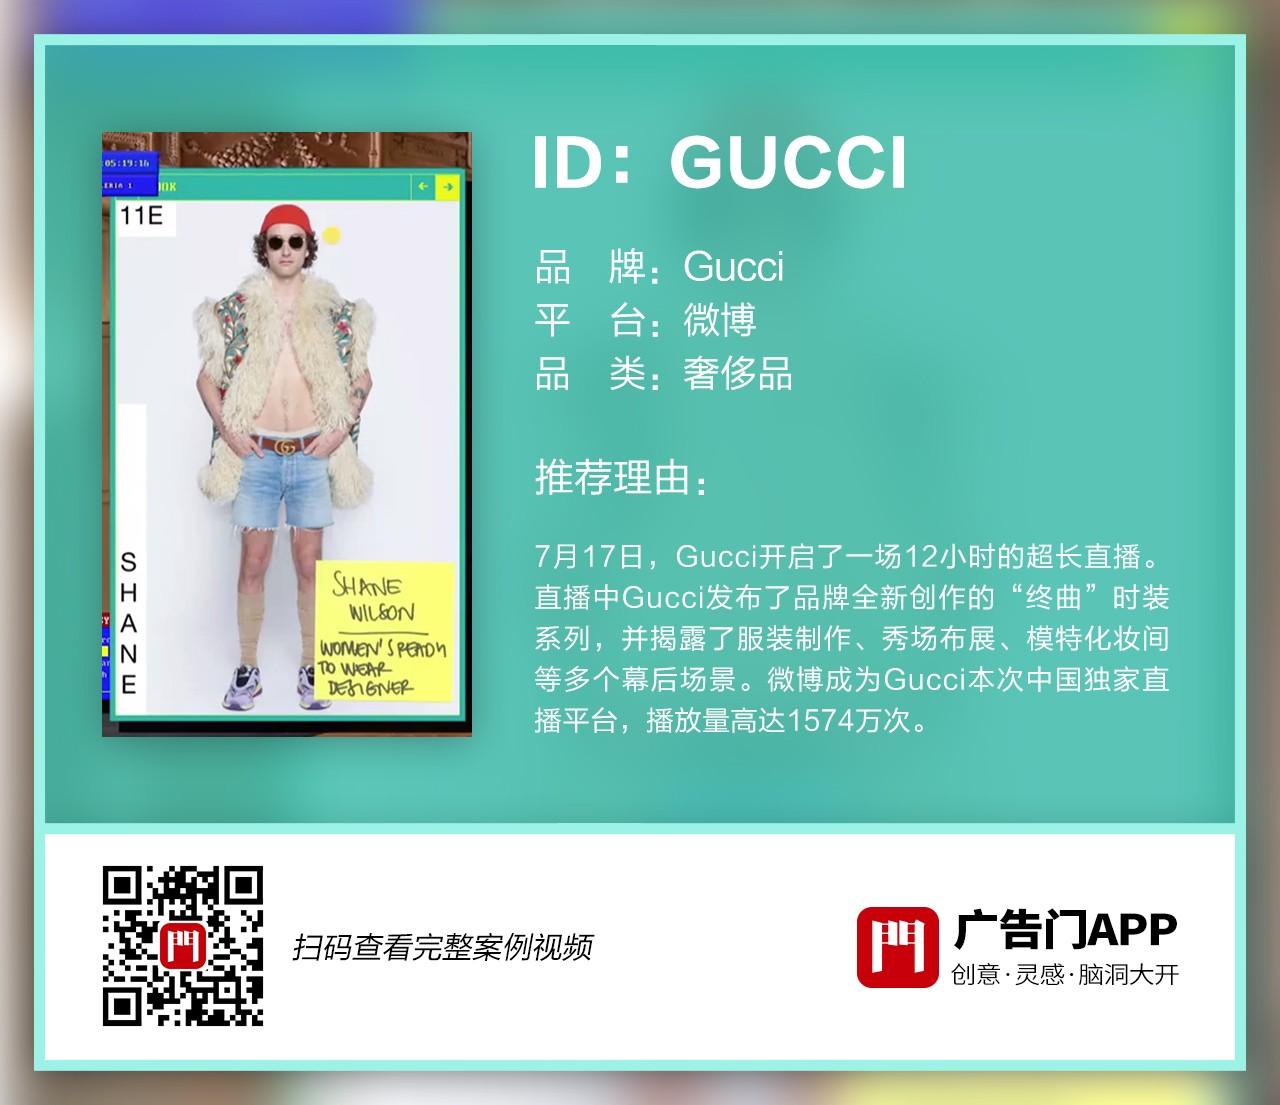 Gucci史上最长时装直播秀,播放量超1574万!.jpg